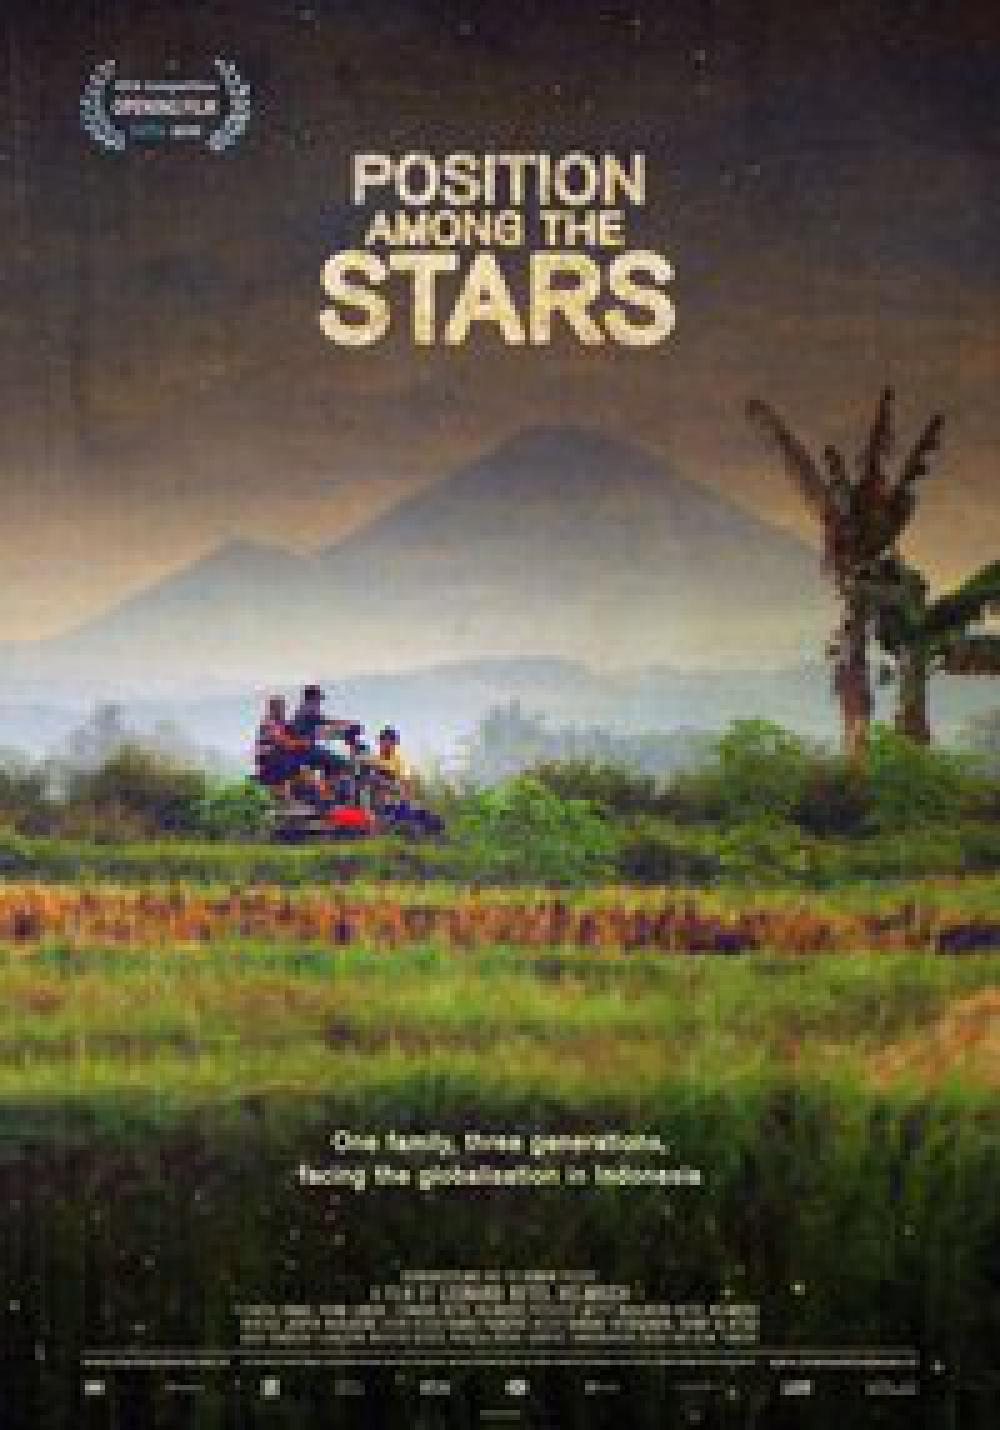 A Film About Indonesia in Sundance Film Festival